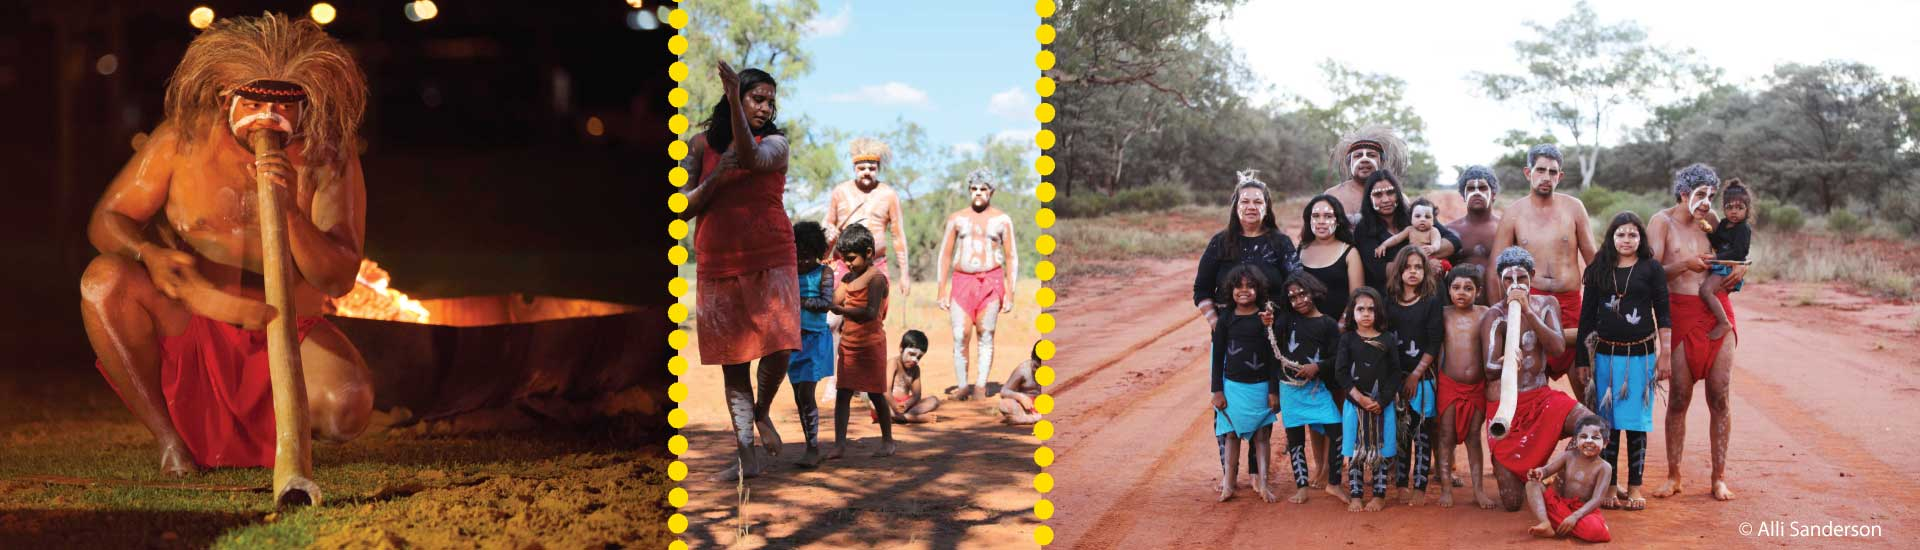 Guwamu Aboriginal dancers, aboriginal festival, dancing festival, australia festival, cunnamulla festival, cunnamullaGuwamu Aboriginal Dancers at Cully Fest